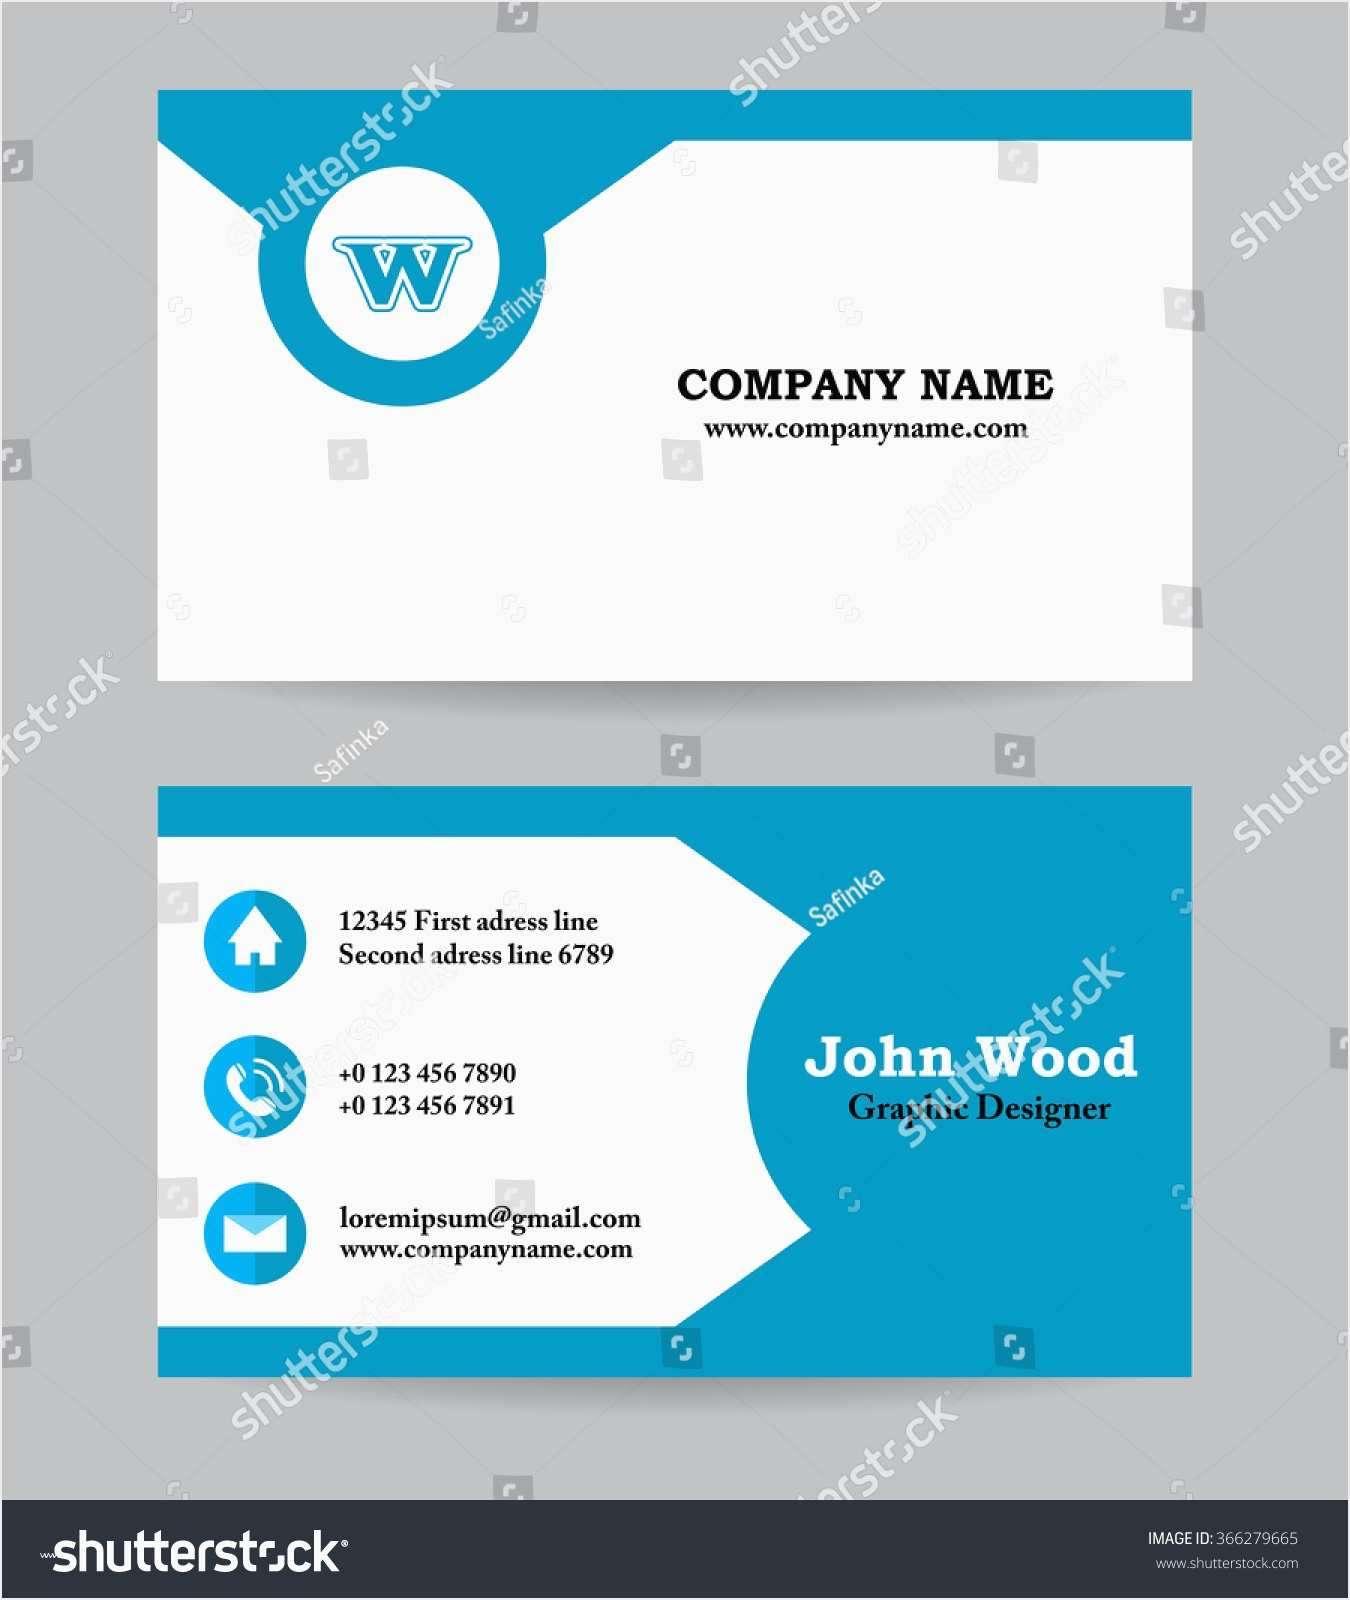 Ibm Business Card Template - Caquetapositivo Intended For Ibm Business Card Template